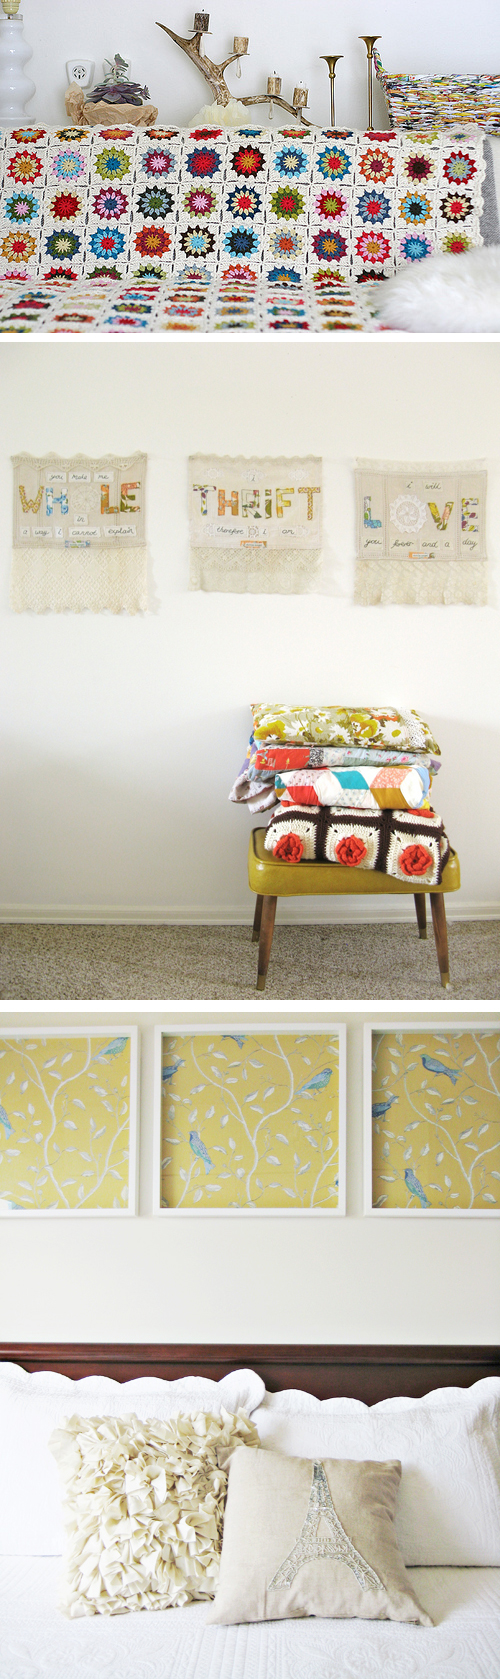 Interior Style: Color Splash!